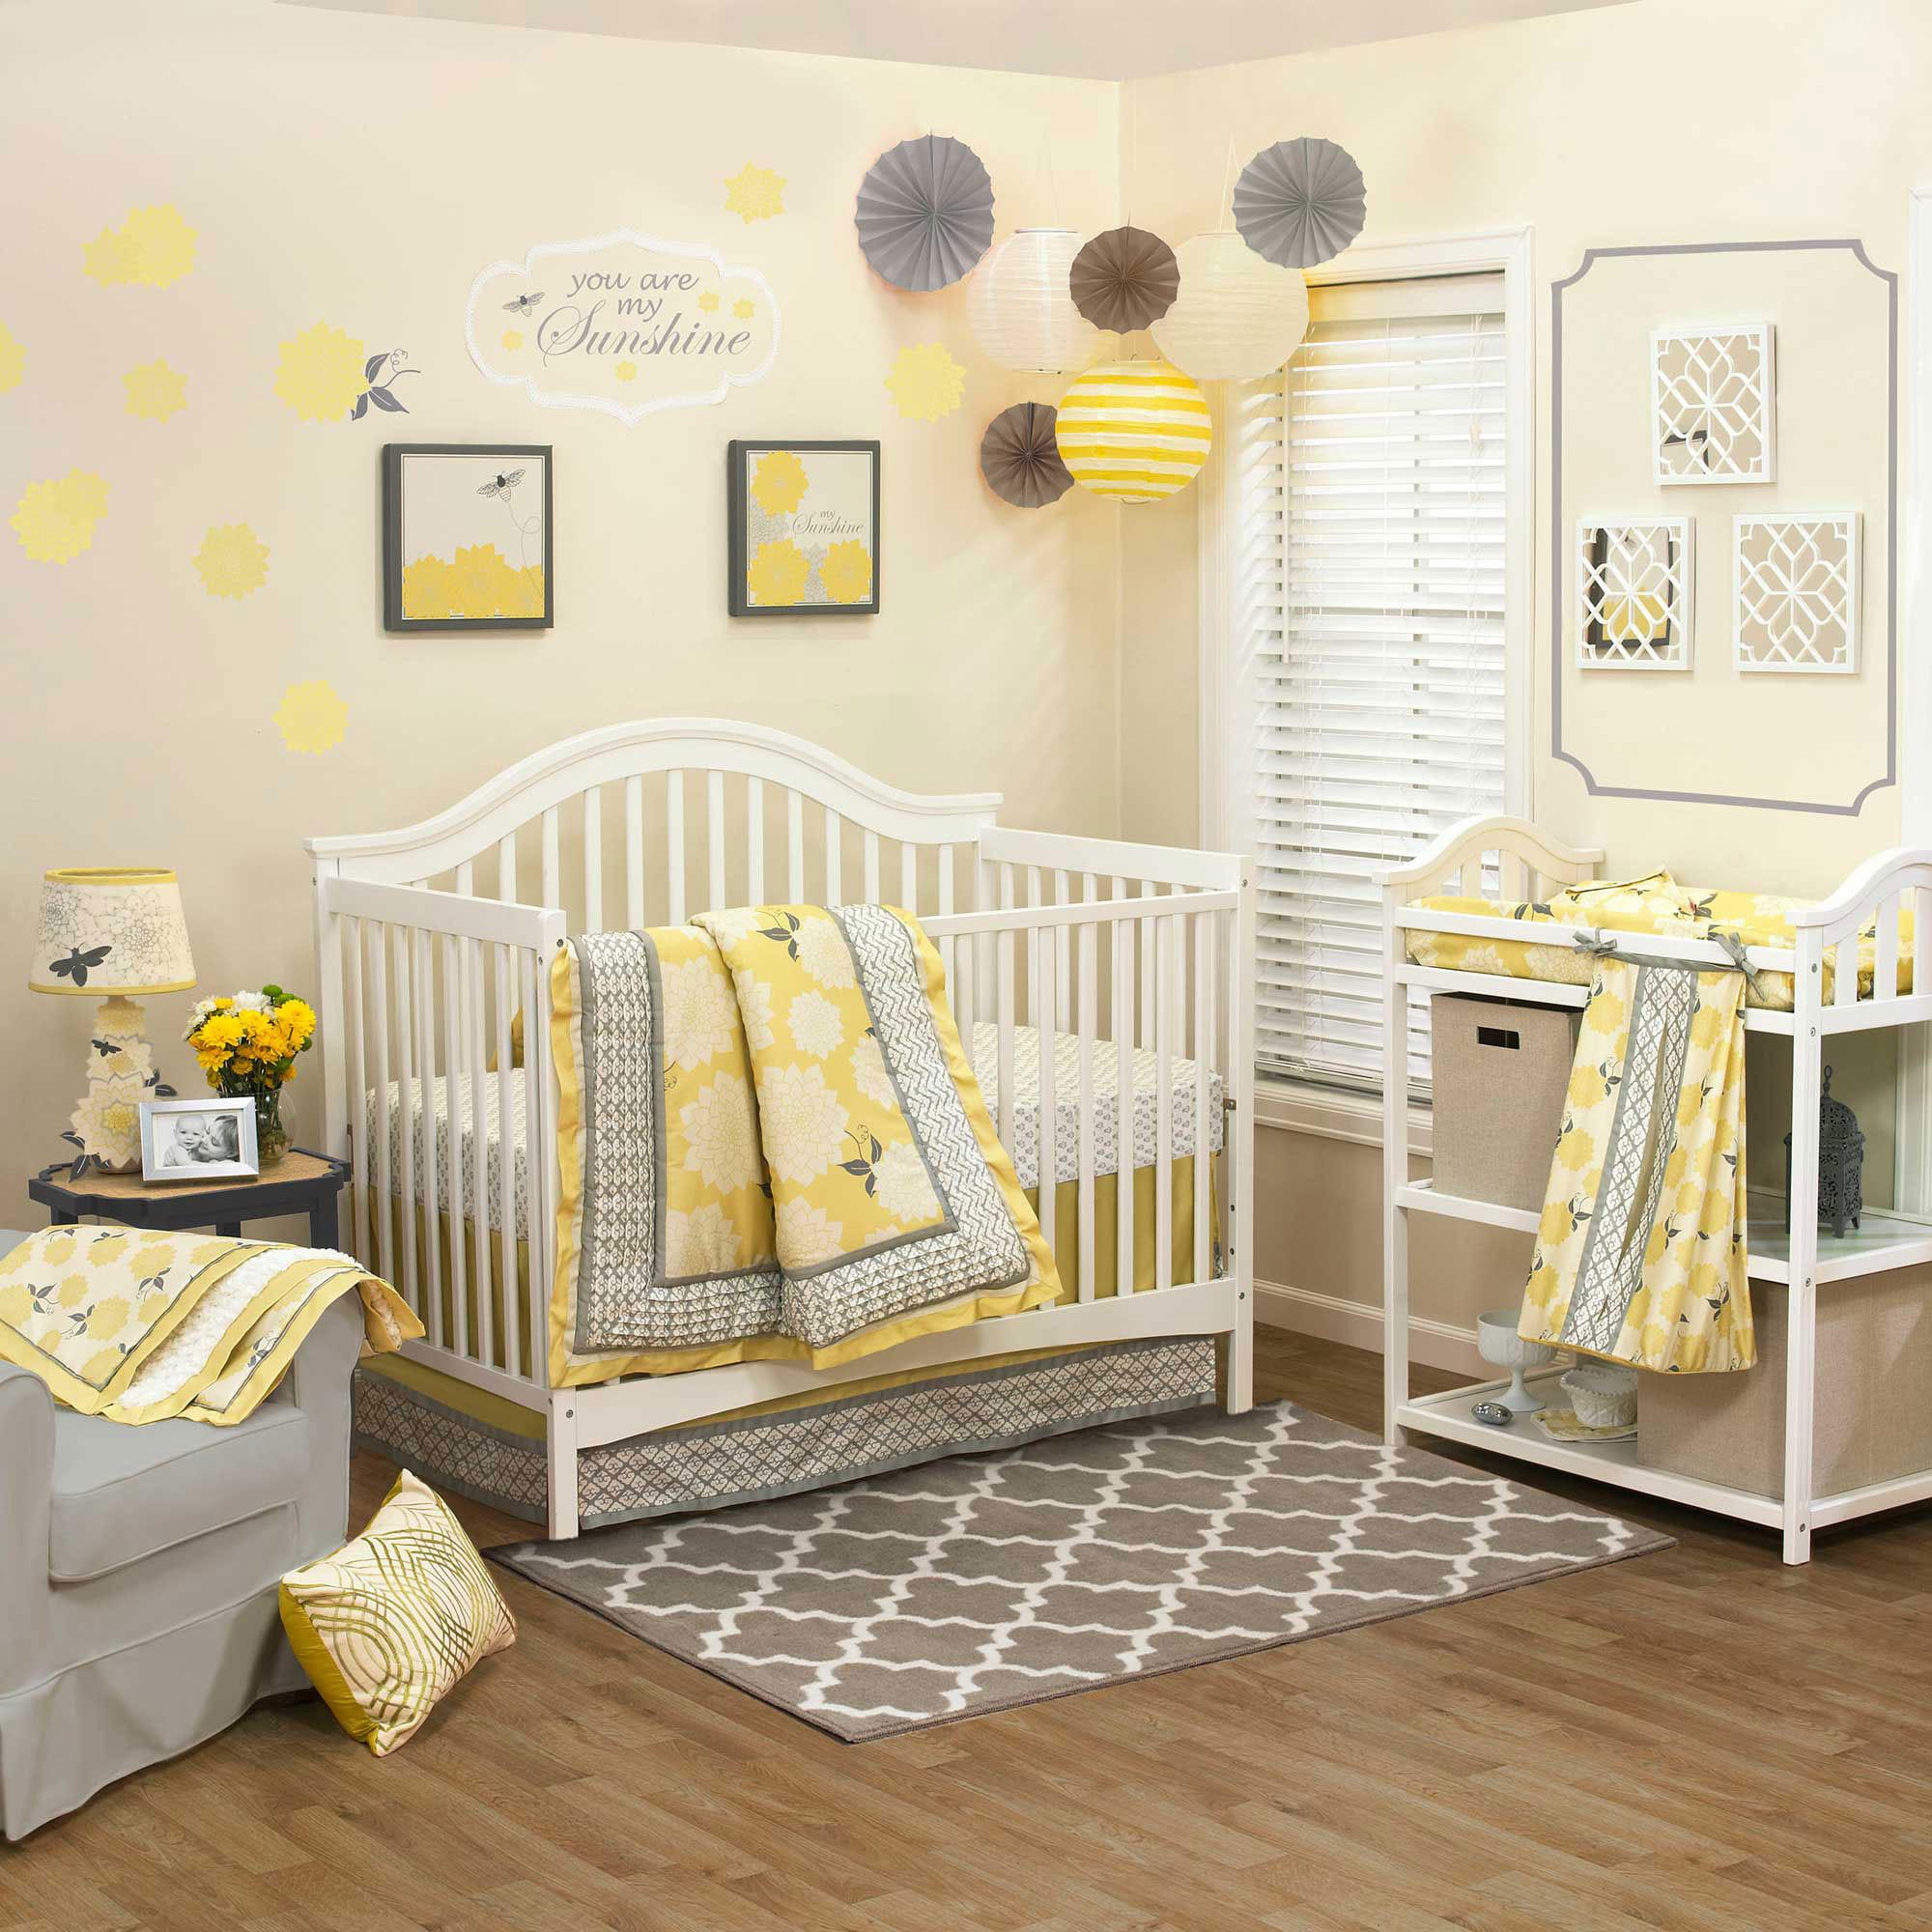 Baby Girls Room Decor Ideas  Baby Girl Nursery Ideas 10 Pretty Examples Decorating Room